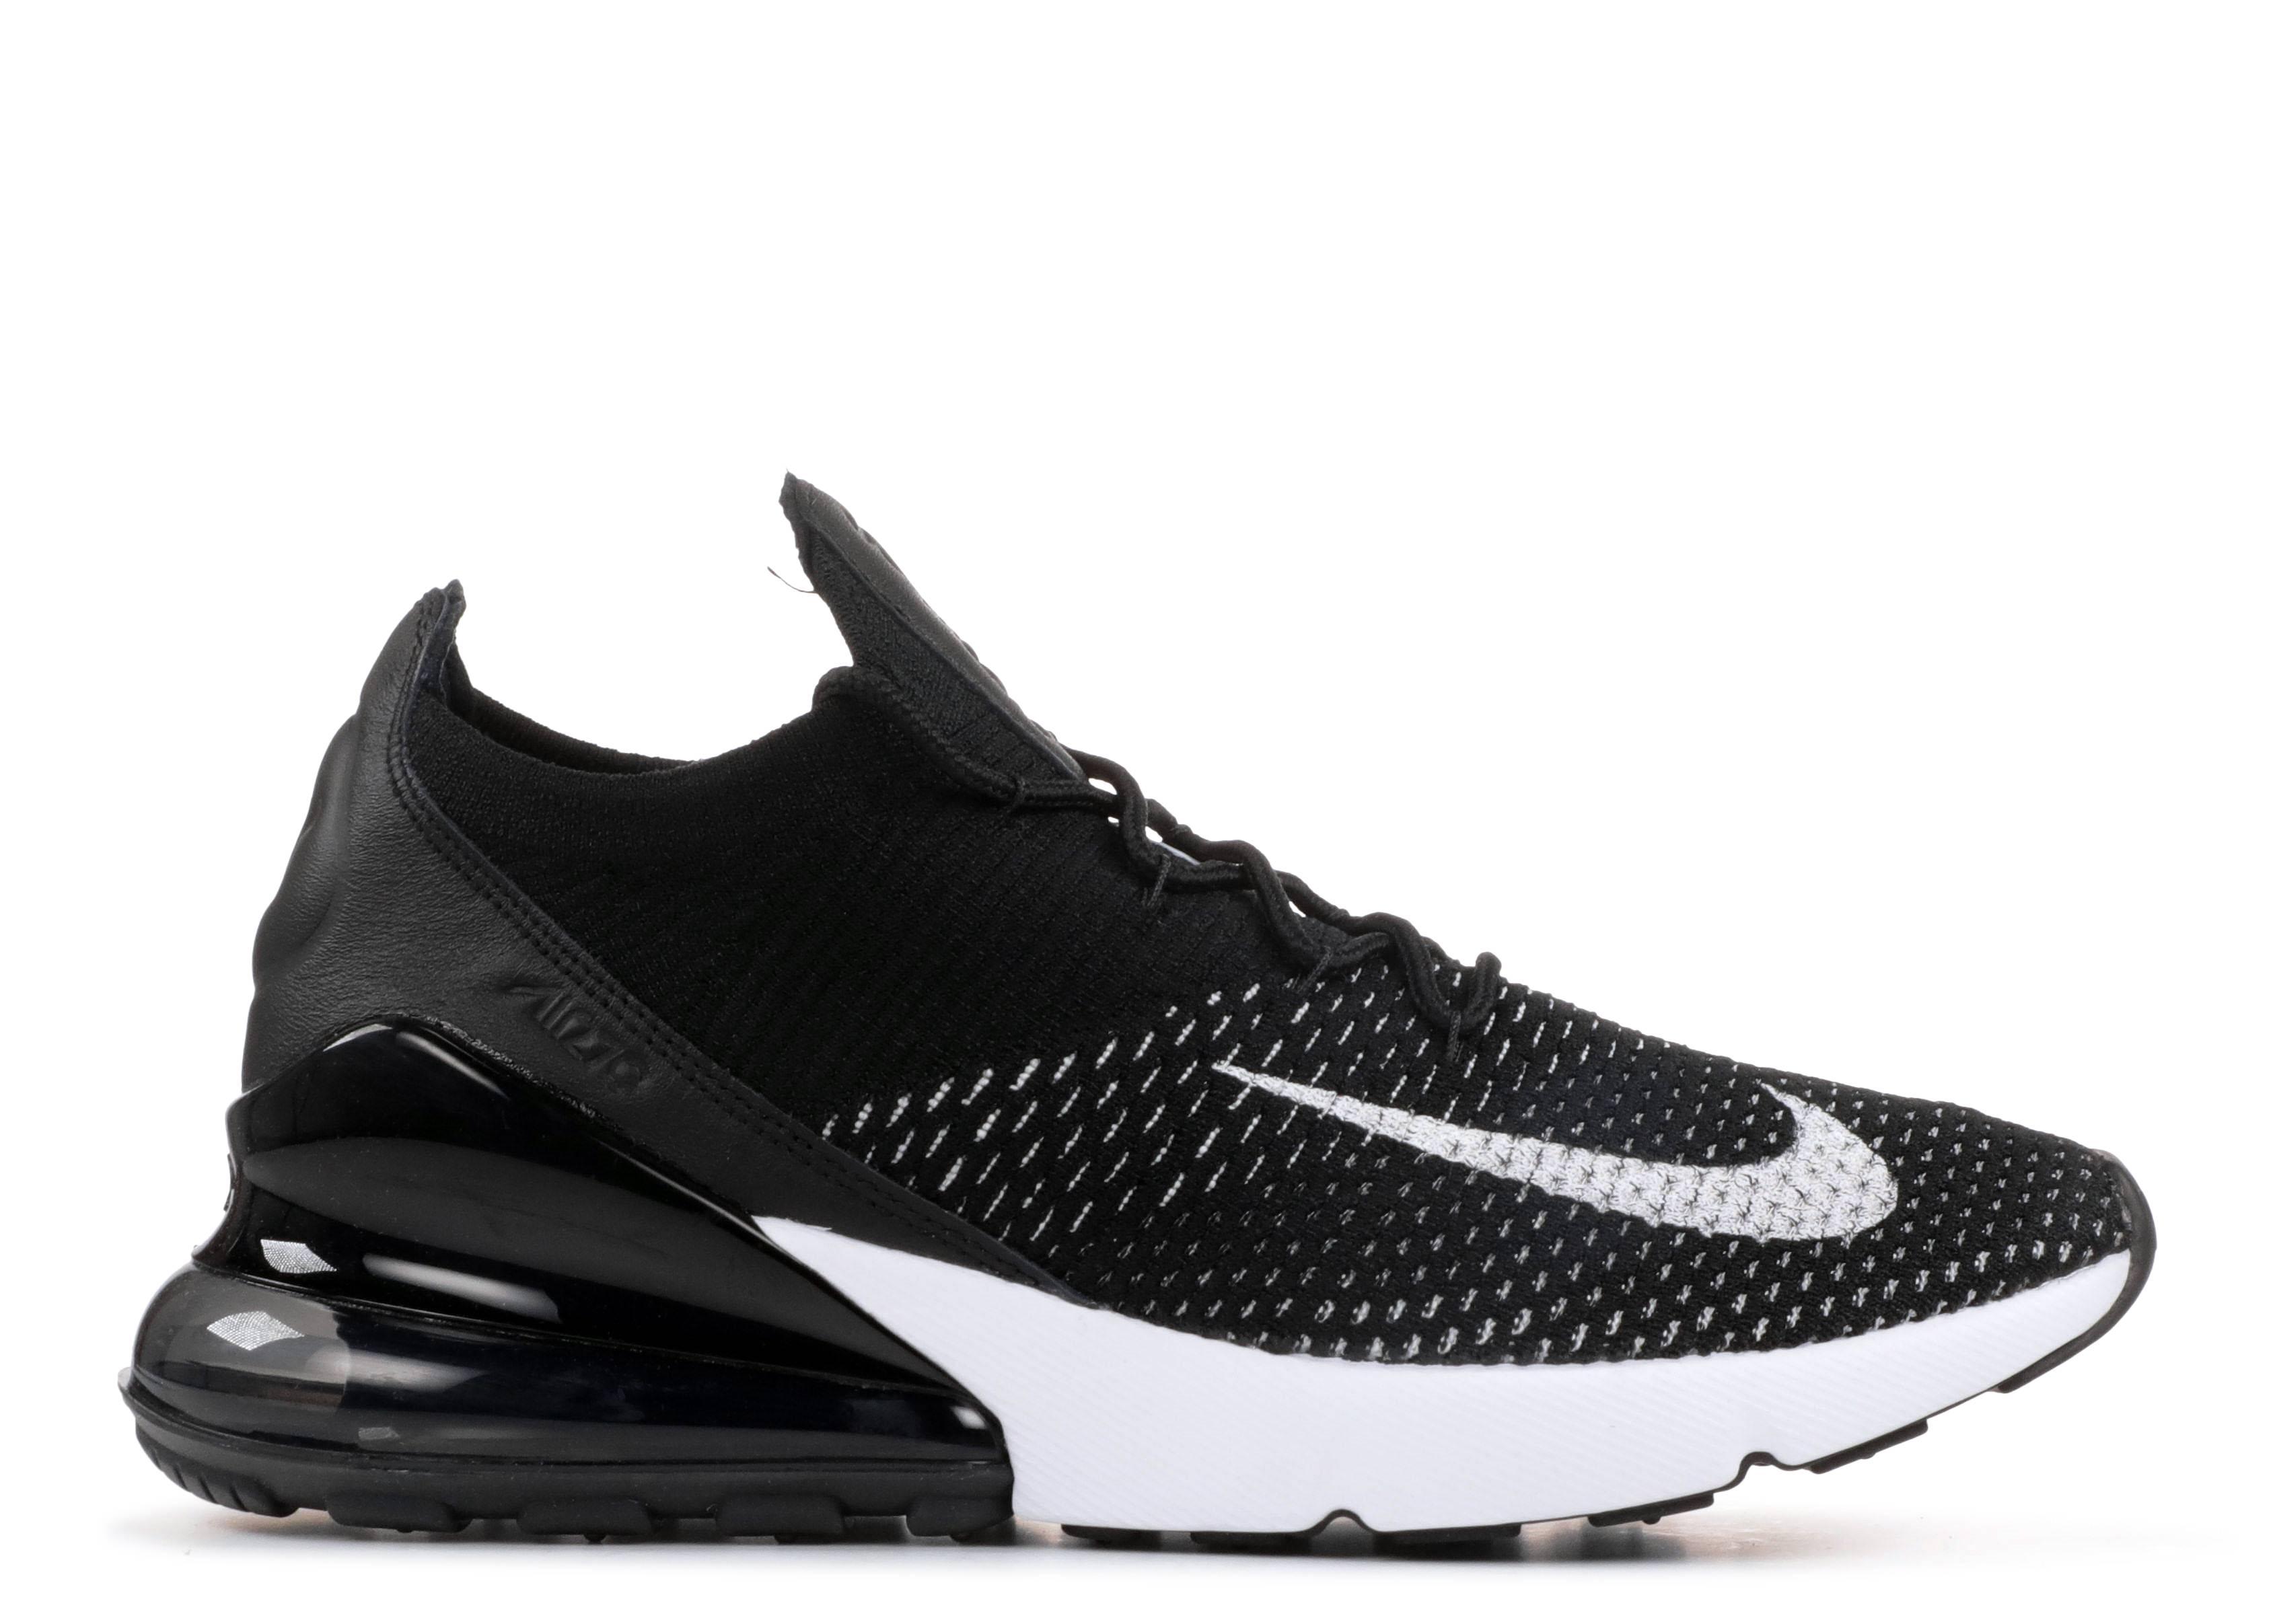 2772b0872bdd W Air Max 270 Flyknit - Nike - AH6803 001 - black white-white ...